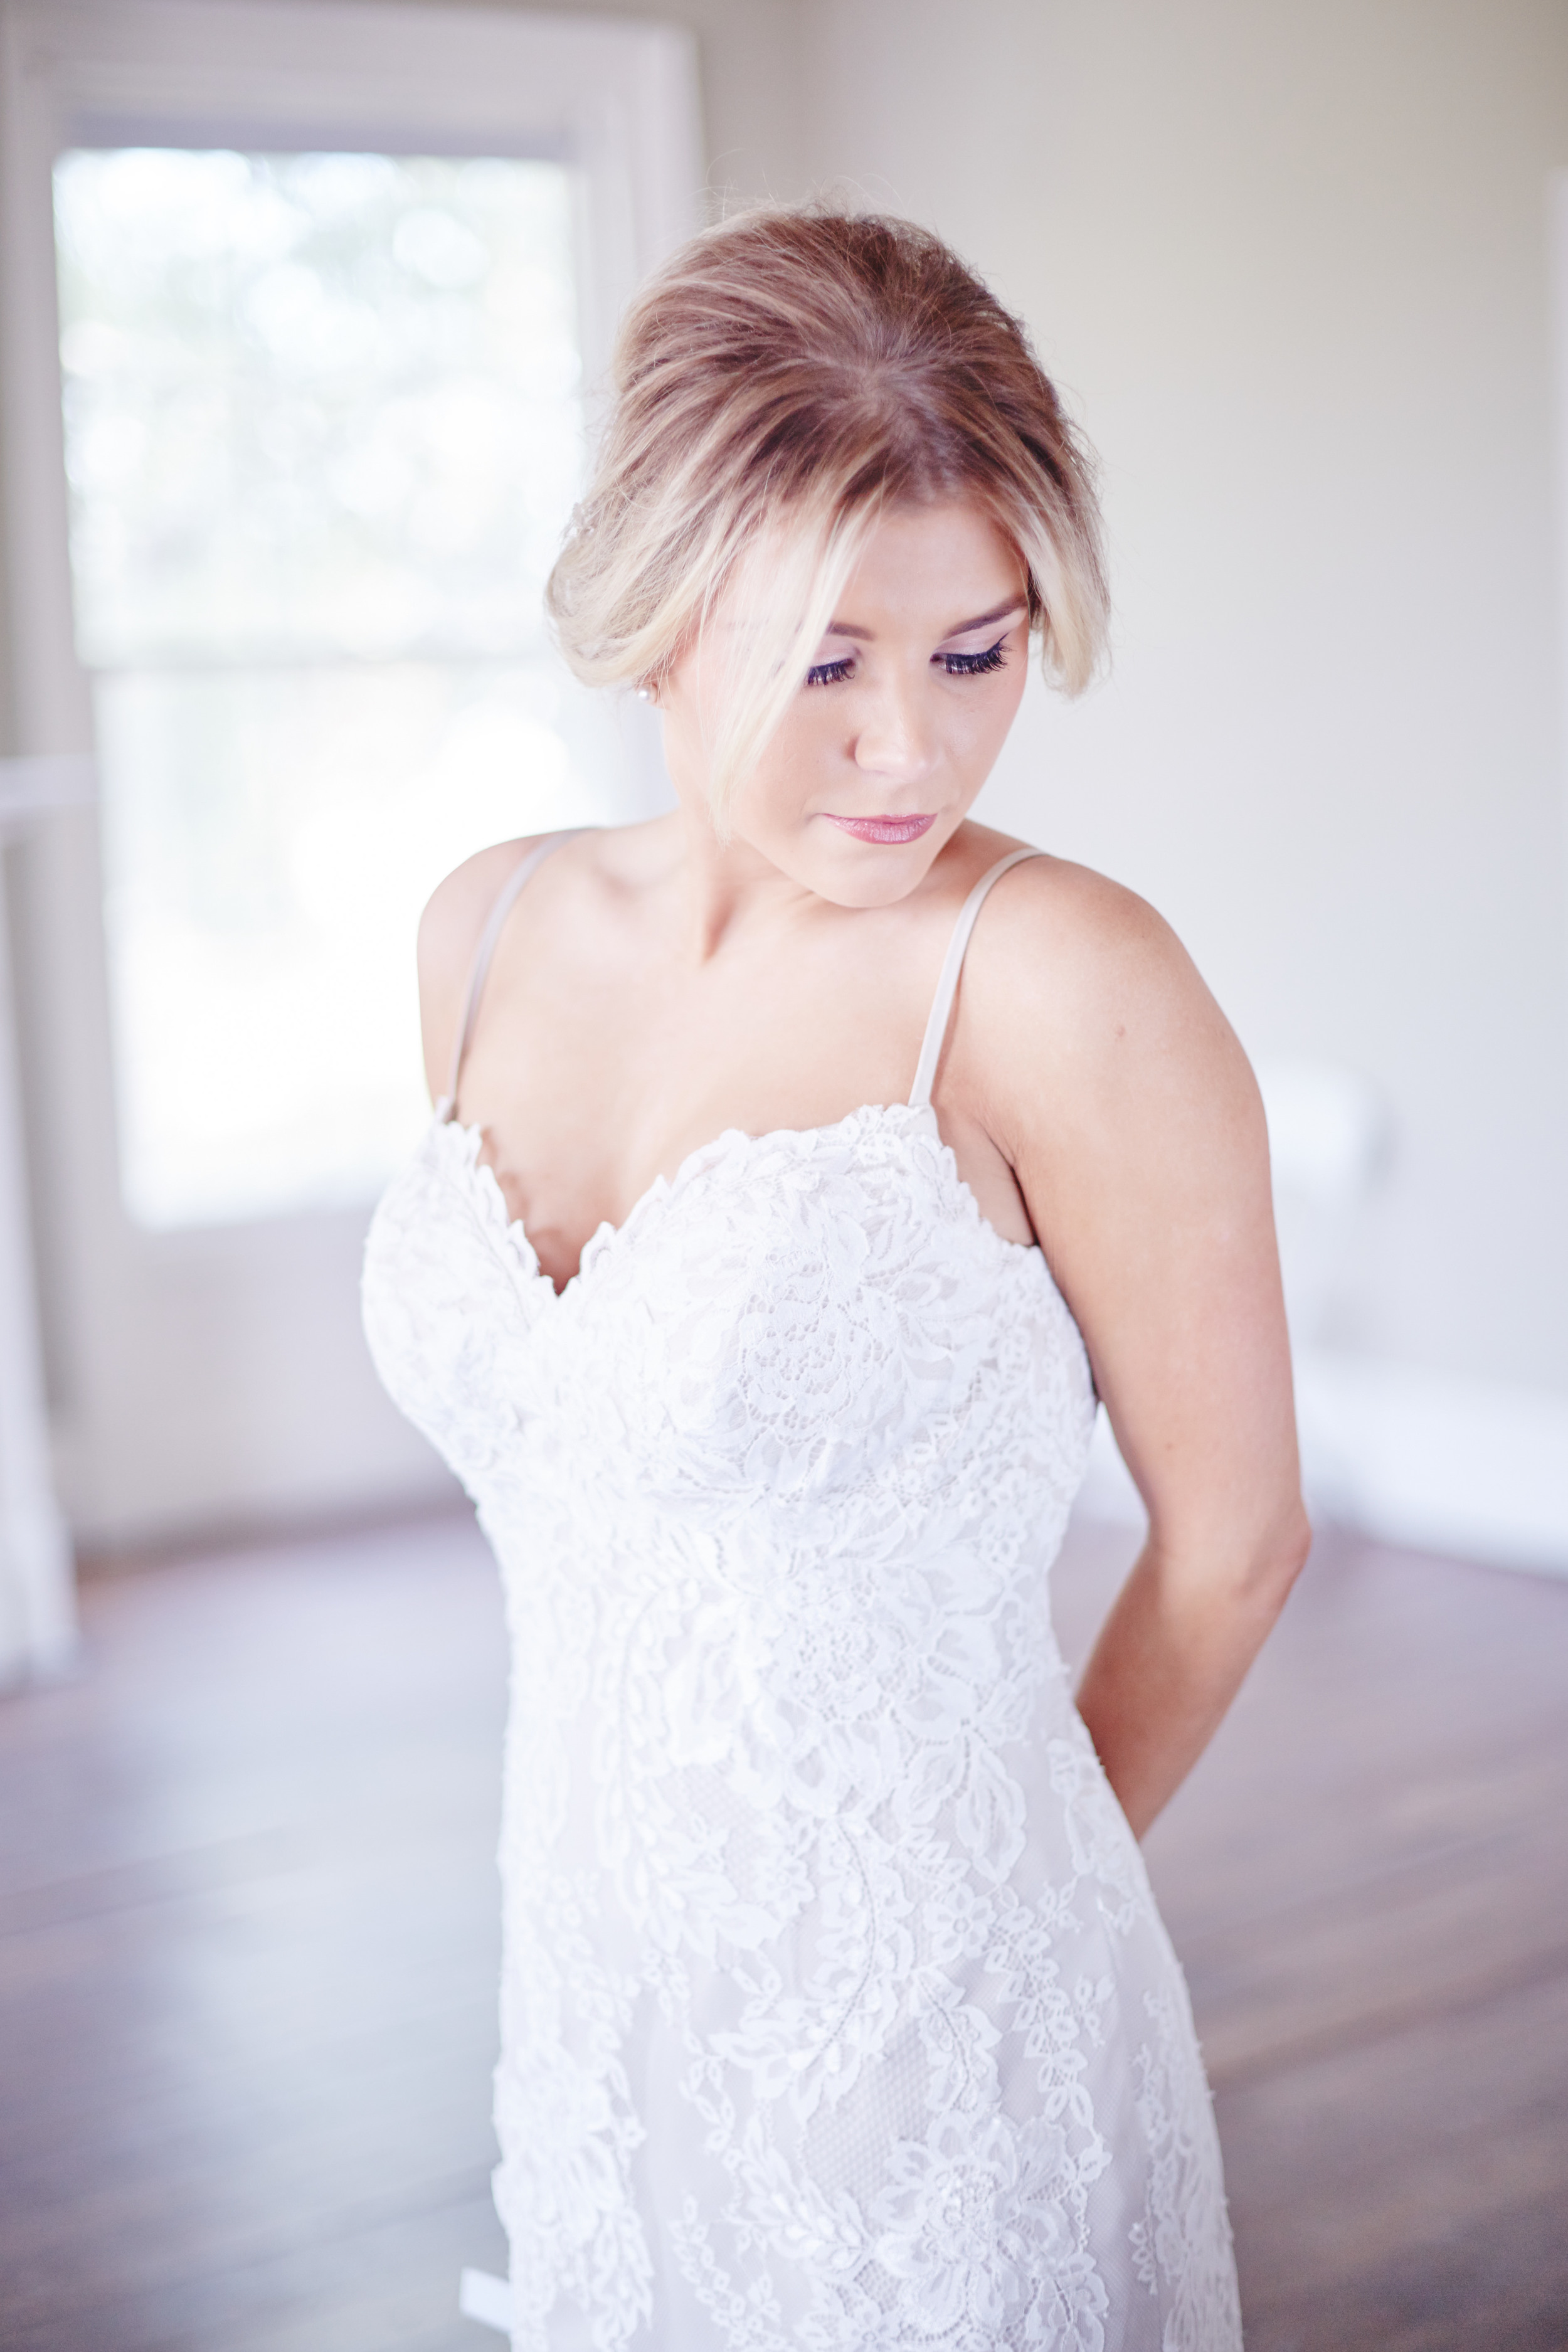 Styled_Session_Becca_Bridal_Portraits_Sarah_Tau_Photography_HOB_Studio_285 56.jpg